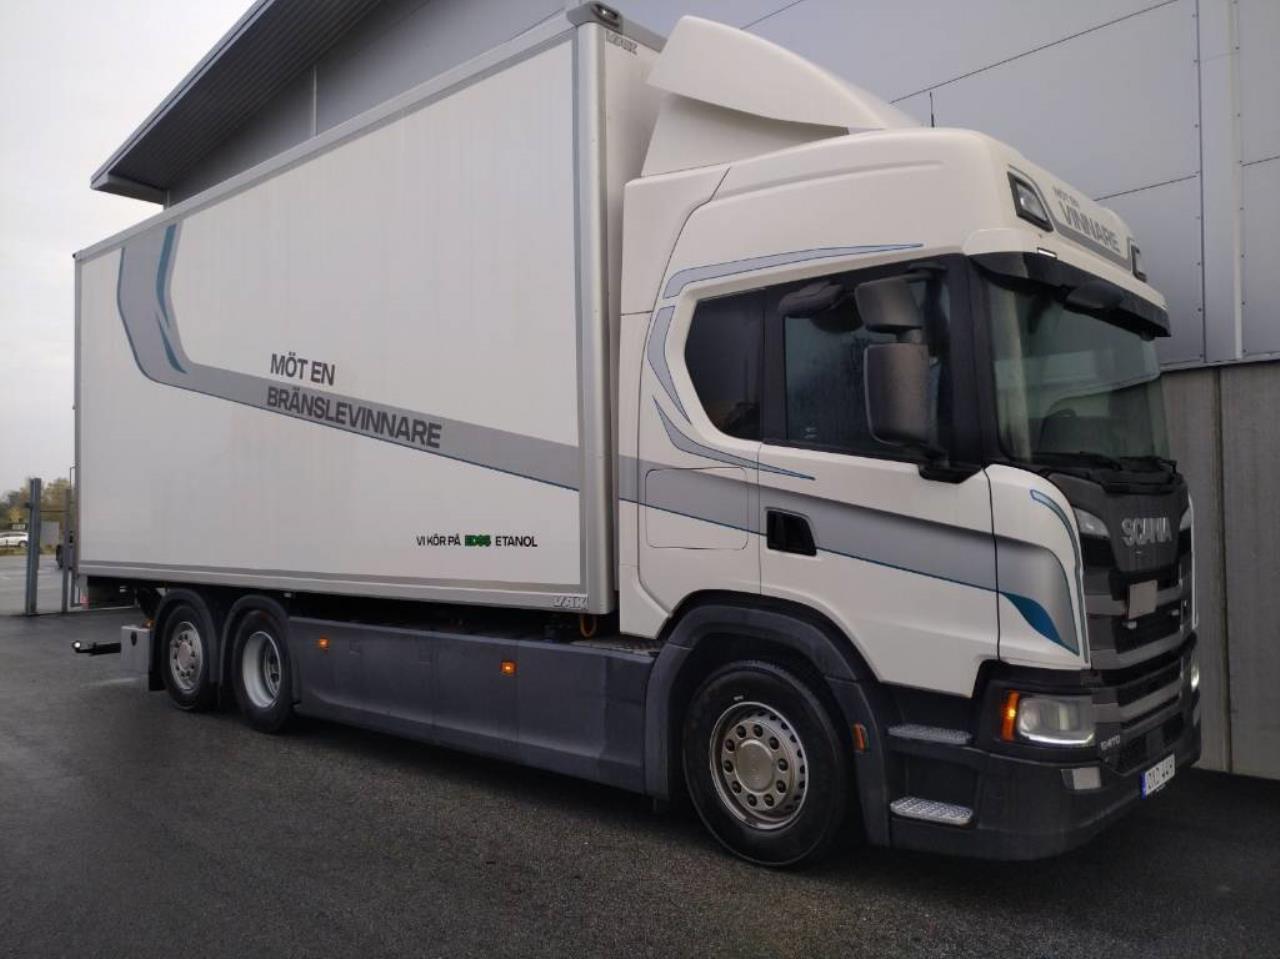 Scania G410 6X2*4 Etanol Euro 6 2019 - Skåp